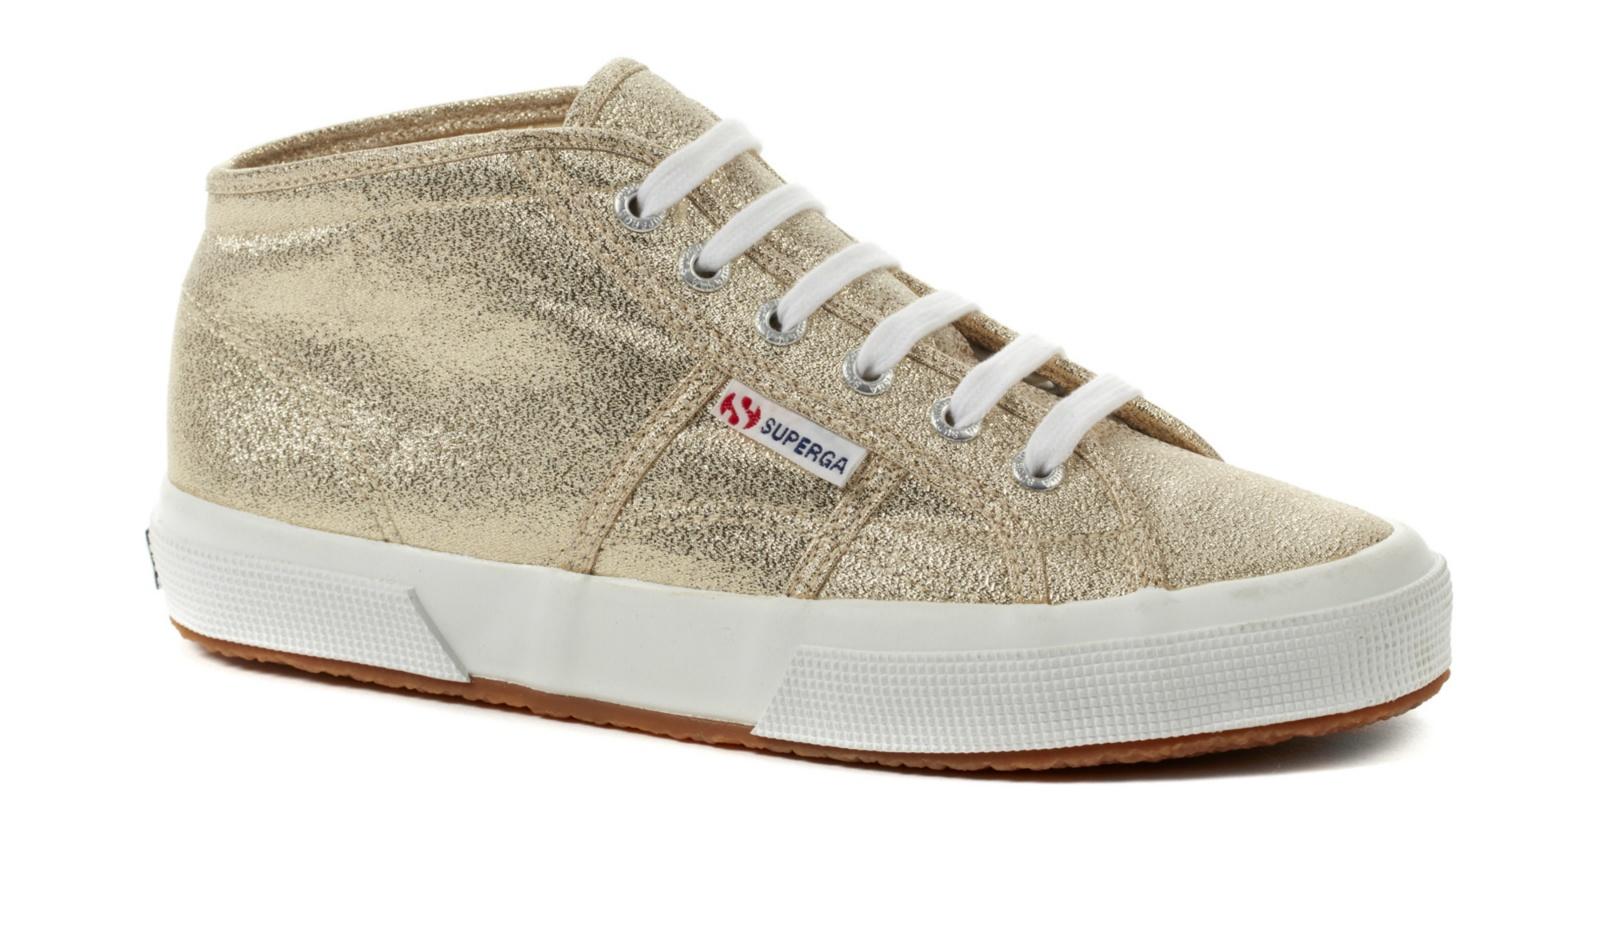 Superga Shoes Online